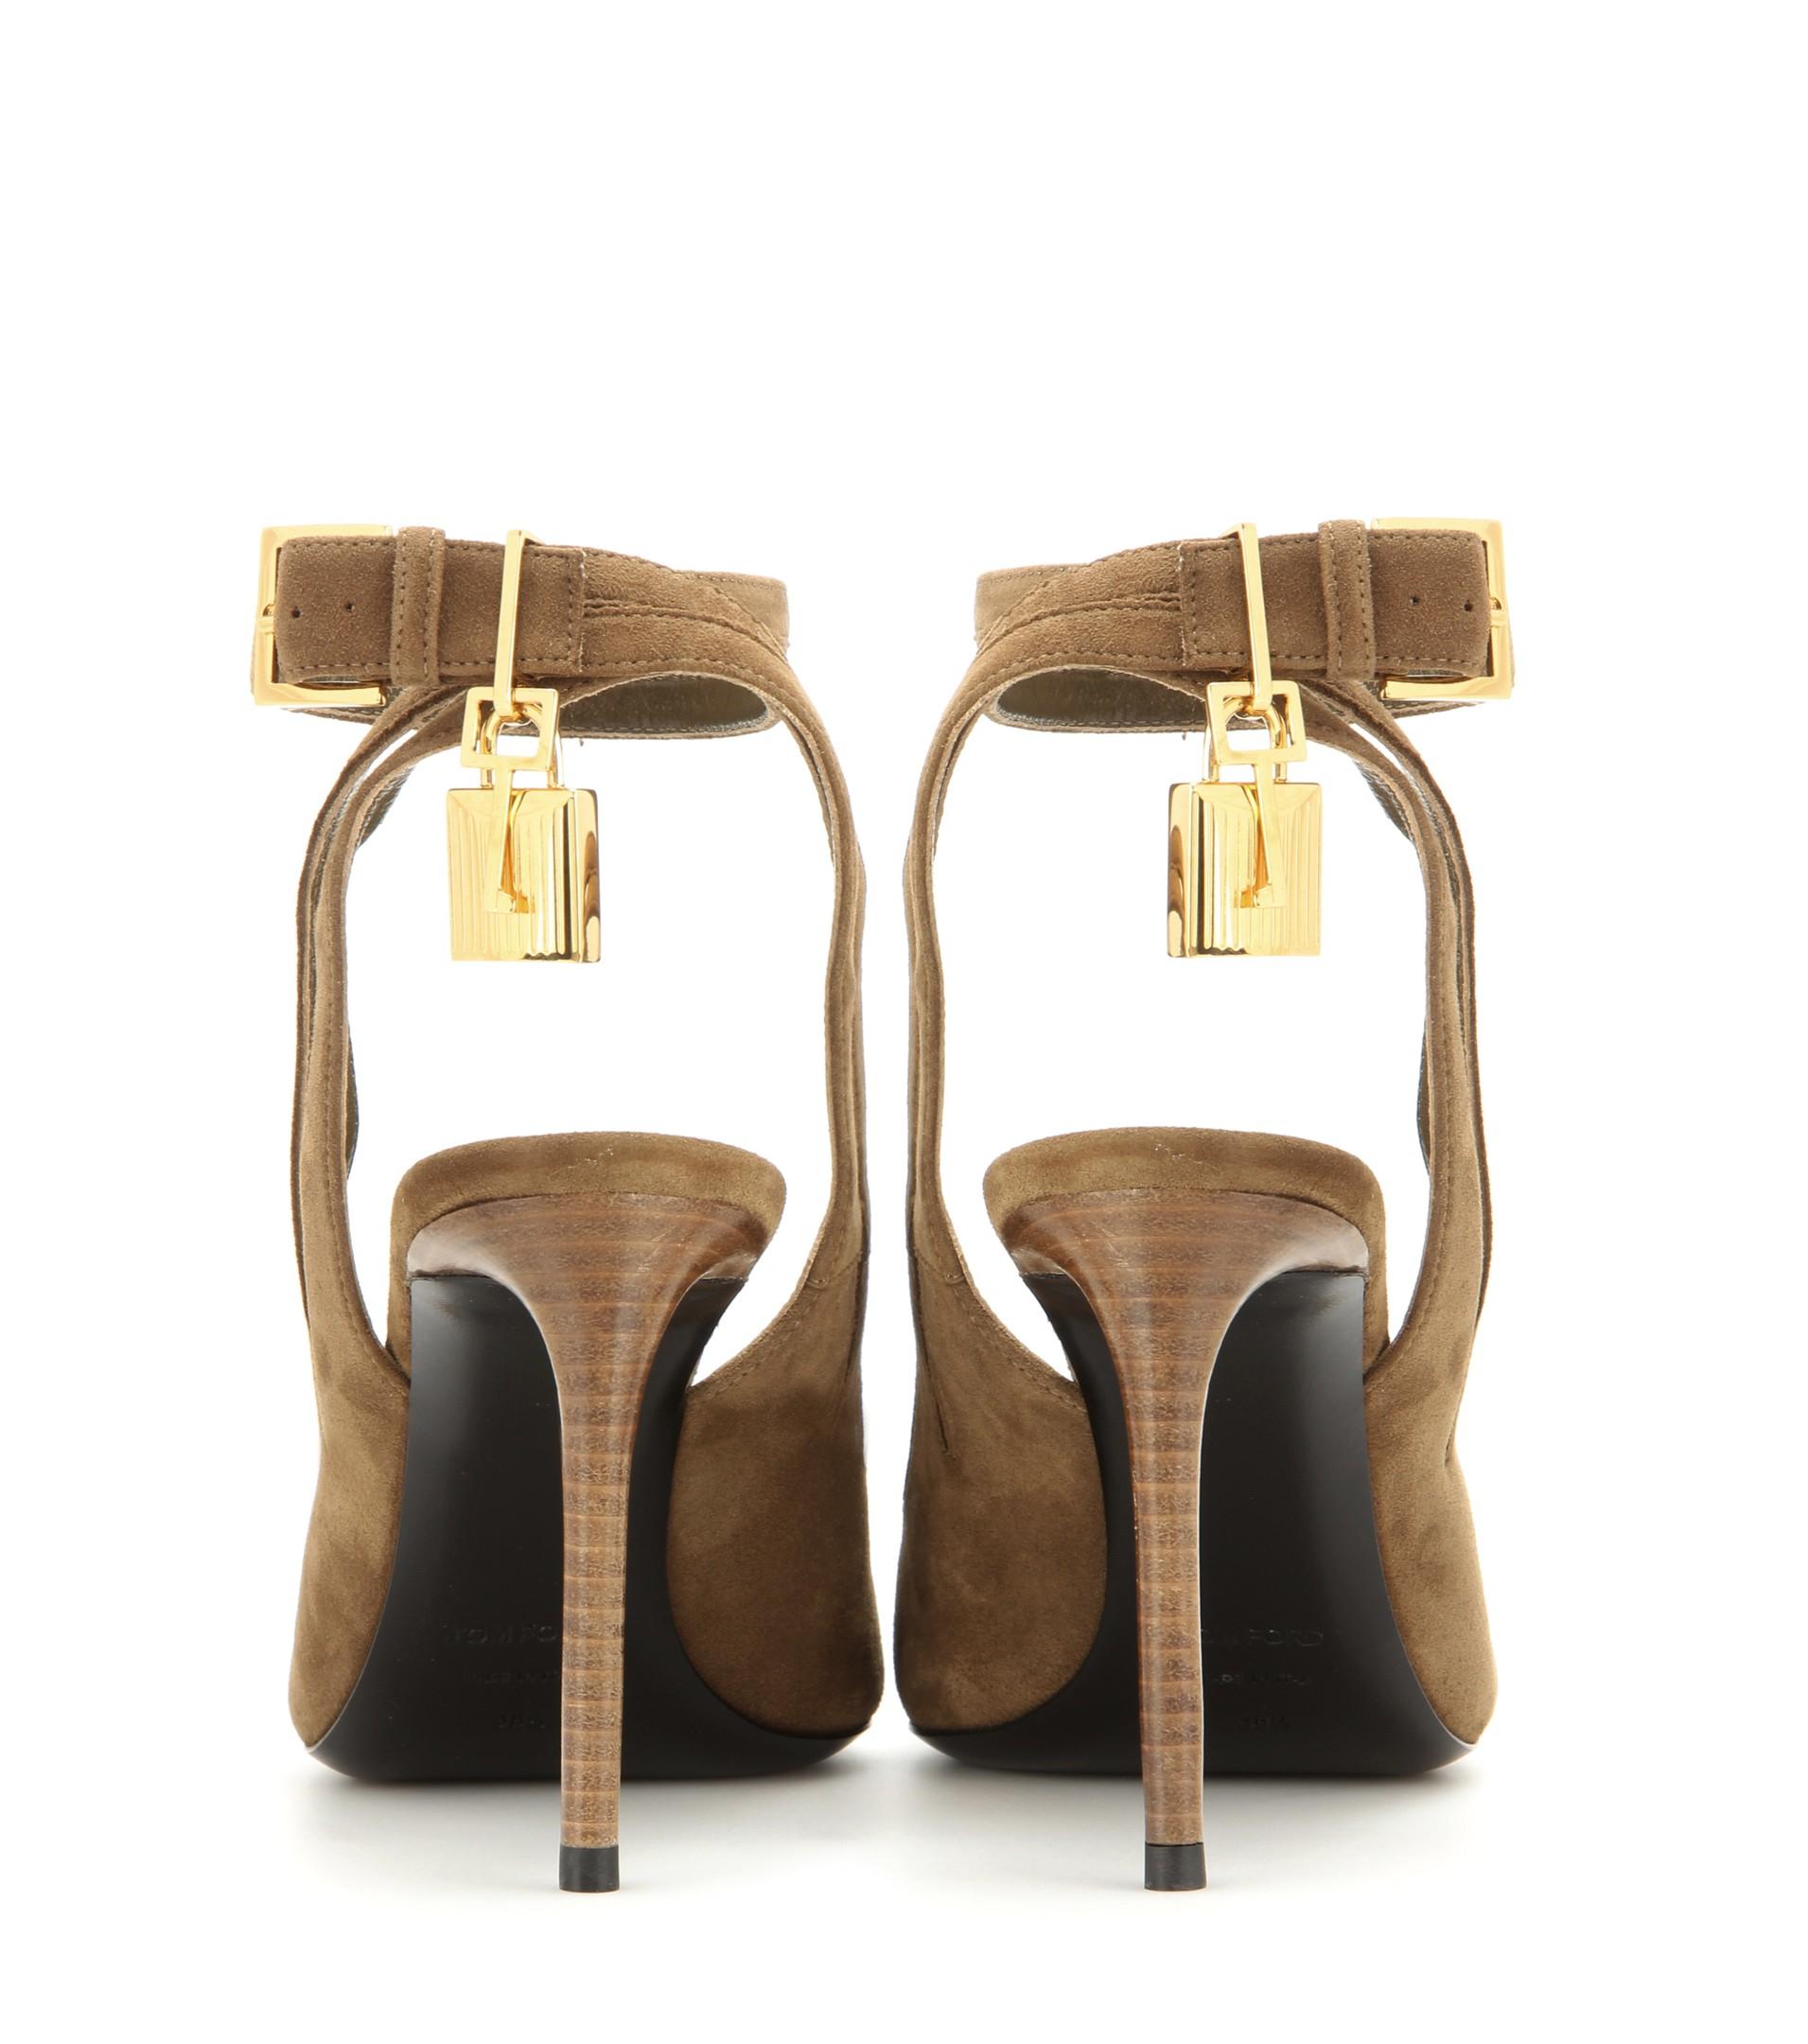 kim tom heels kardashian gold i wears sandals bar shoes ford pin t chain